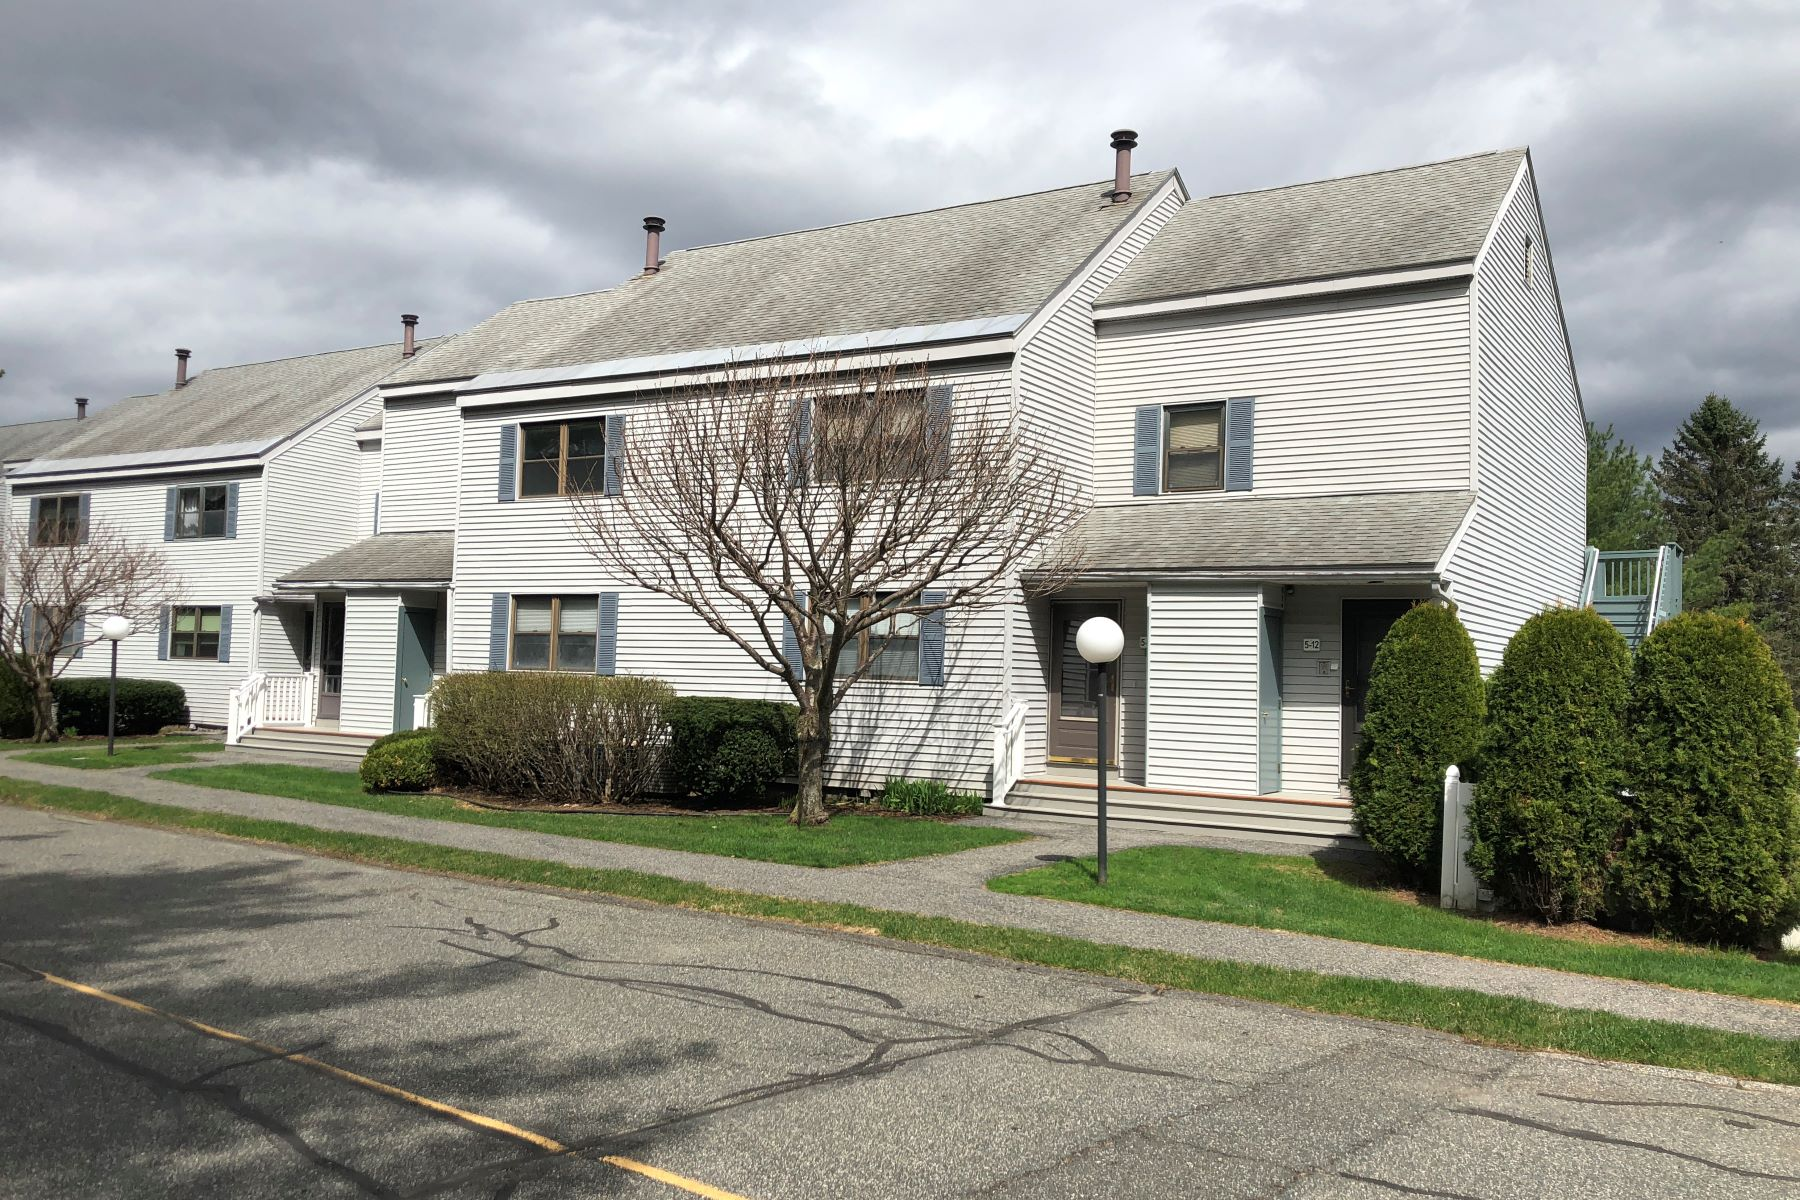 Condominiums 为 销售 在 Wonderful Renovated Condo Unit at Rolling Hills 5 Rolling Hills 9, 雷诺克斯, 马萨诸塞州 01240 美国